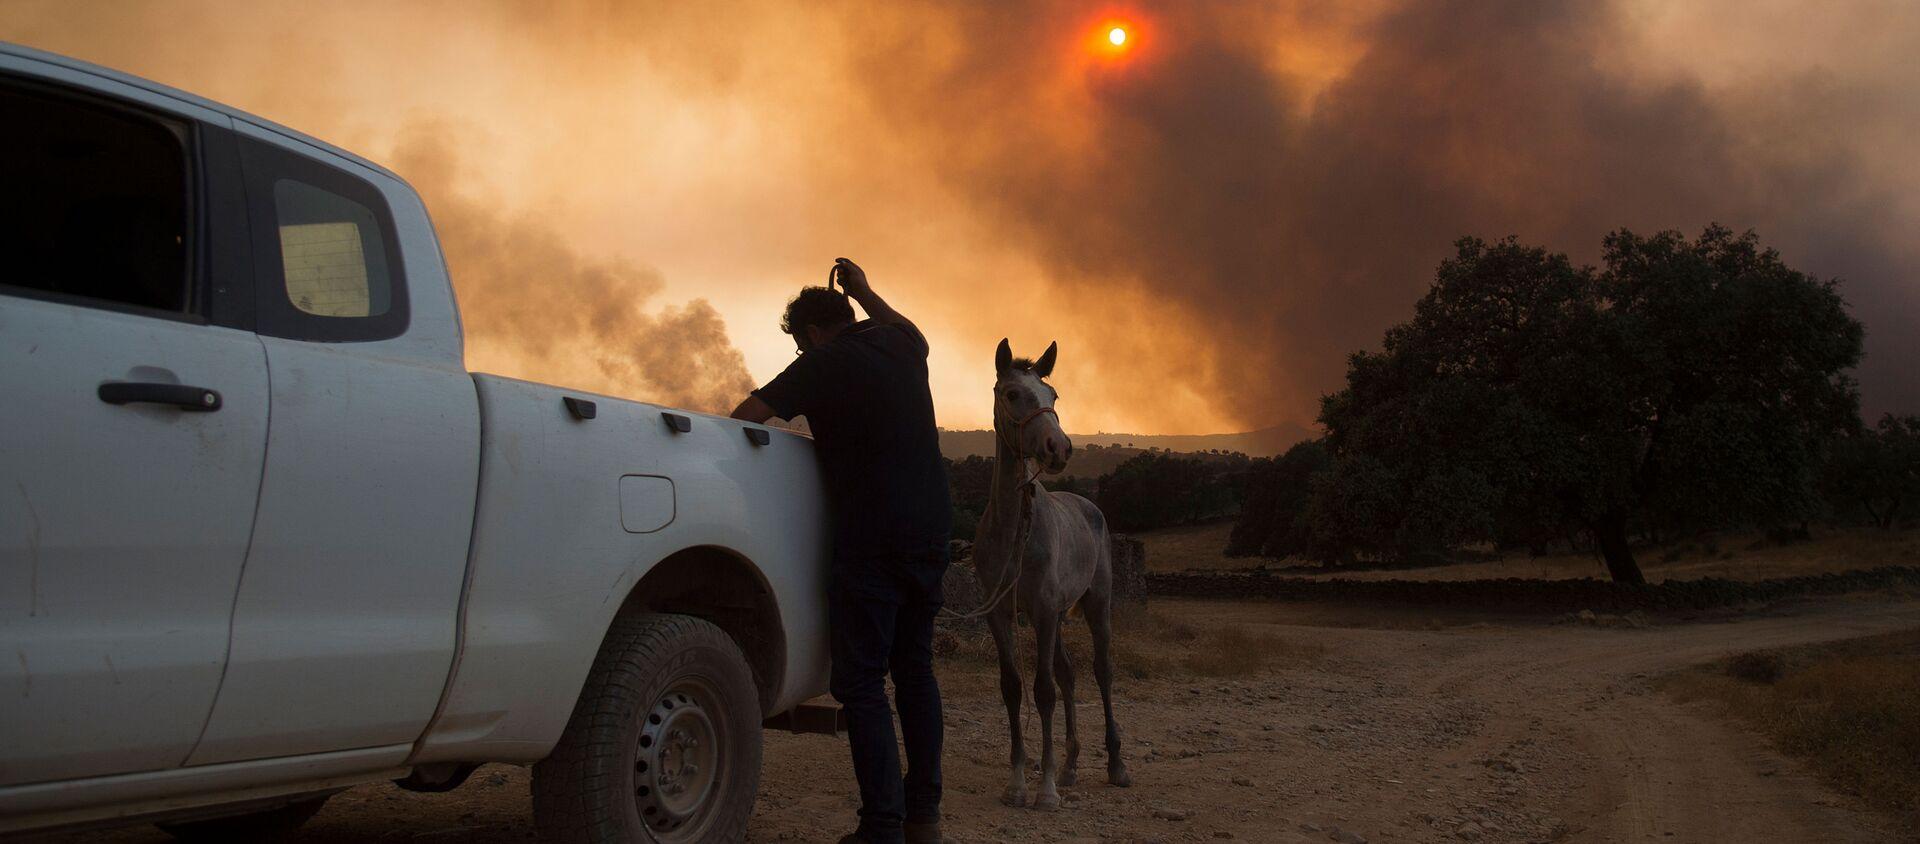 Incendios forestales en Huelva, España  - Sputnik Mundo, 1920, 09.09.2020